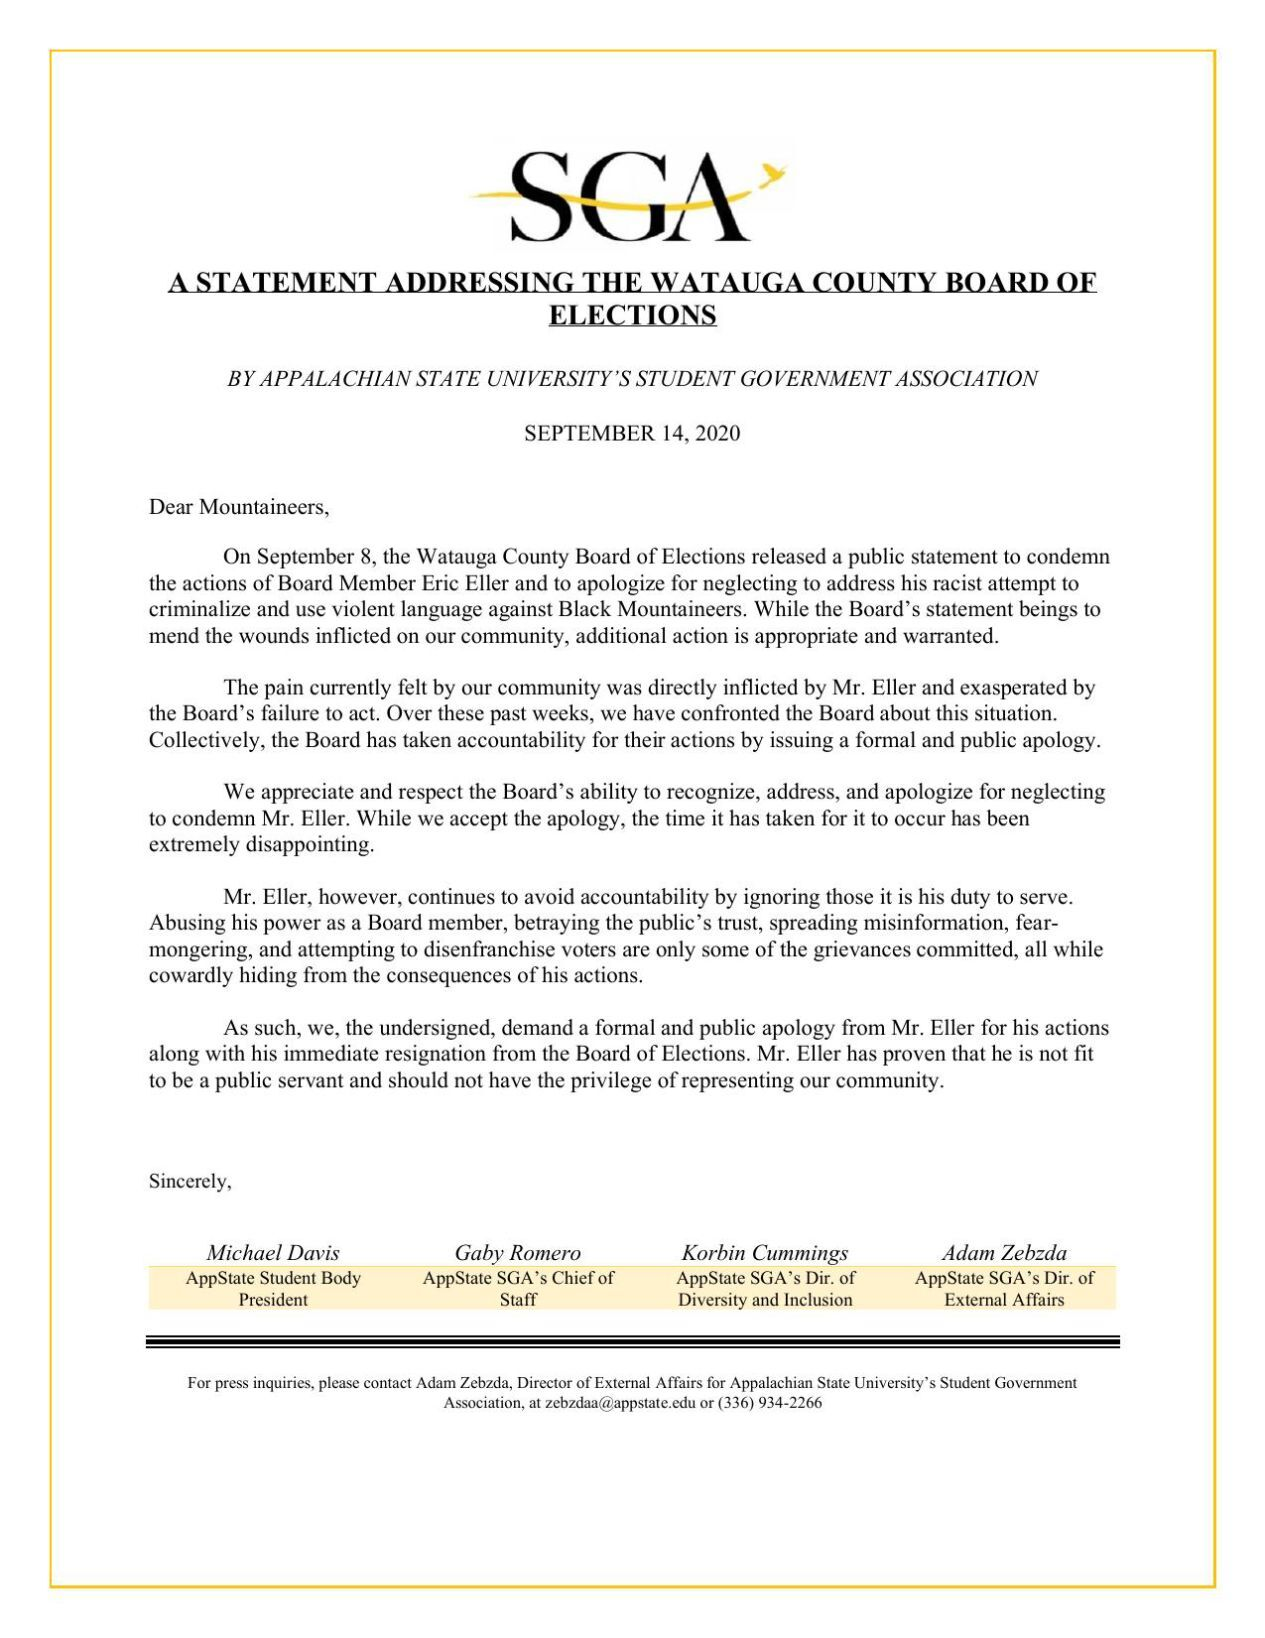 Student Government Association Sept. 14 statement